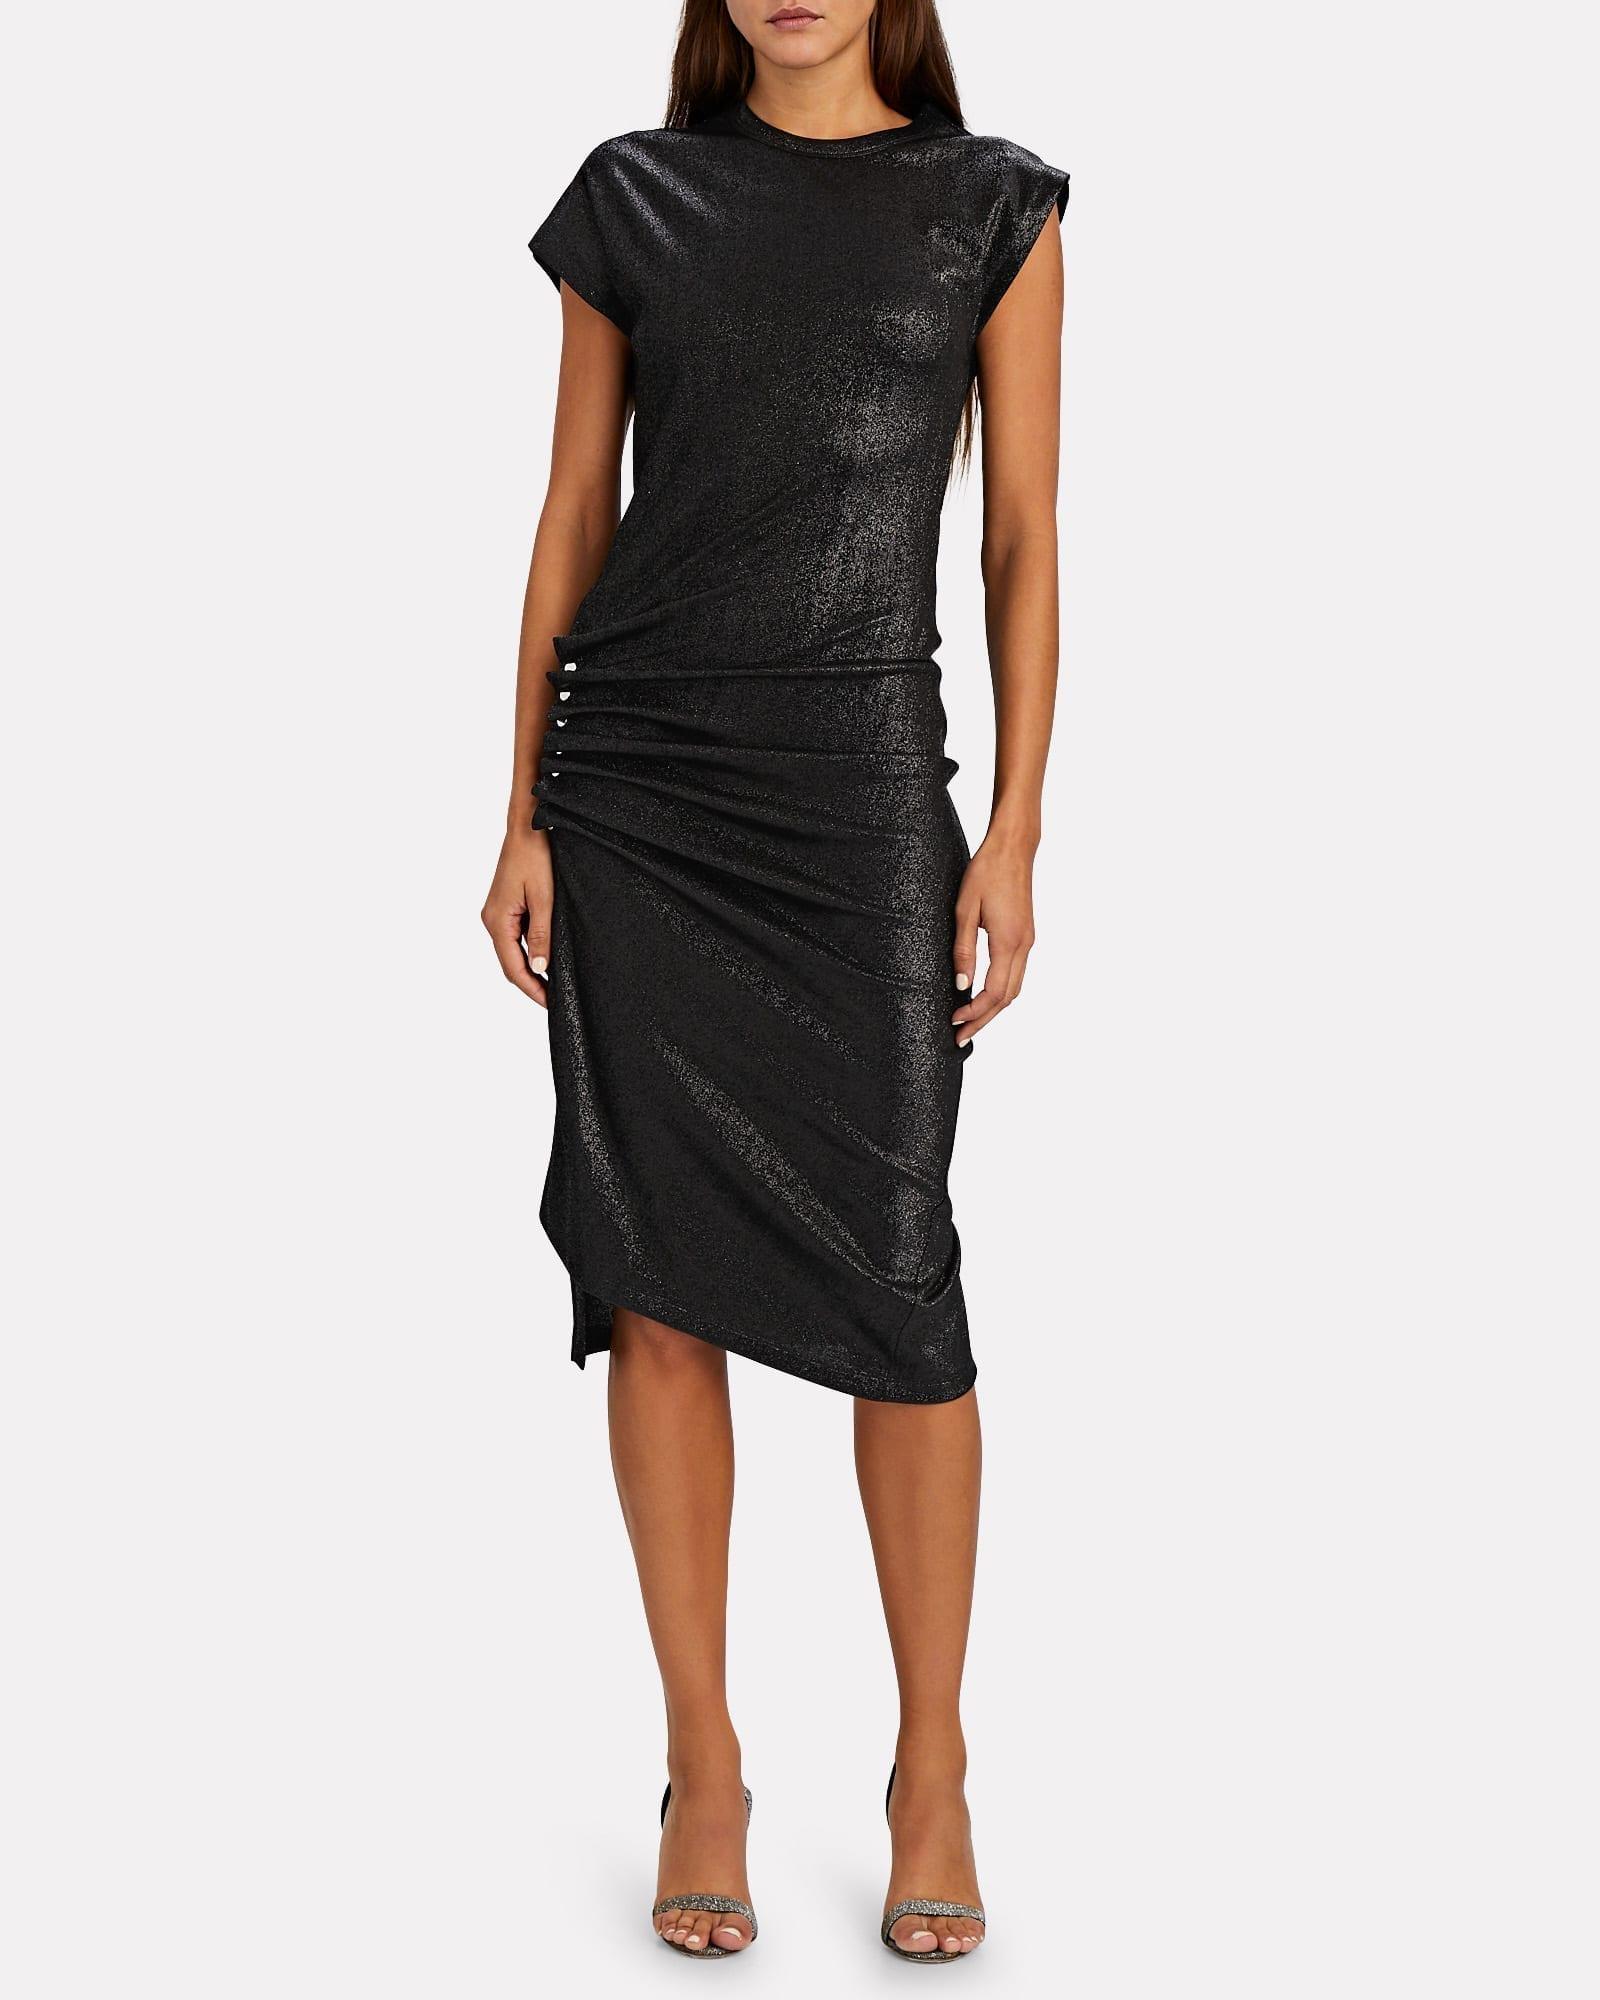 PACO RABANNE Asymmetrical Lurex T-Shirt Dress